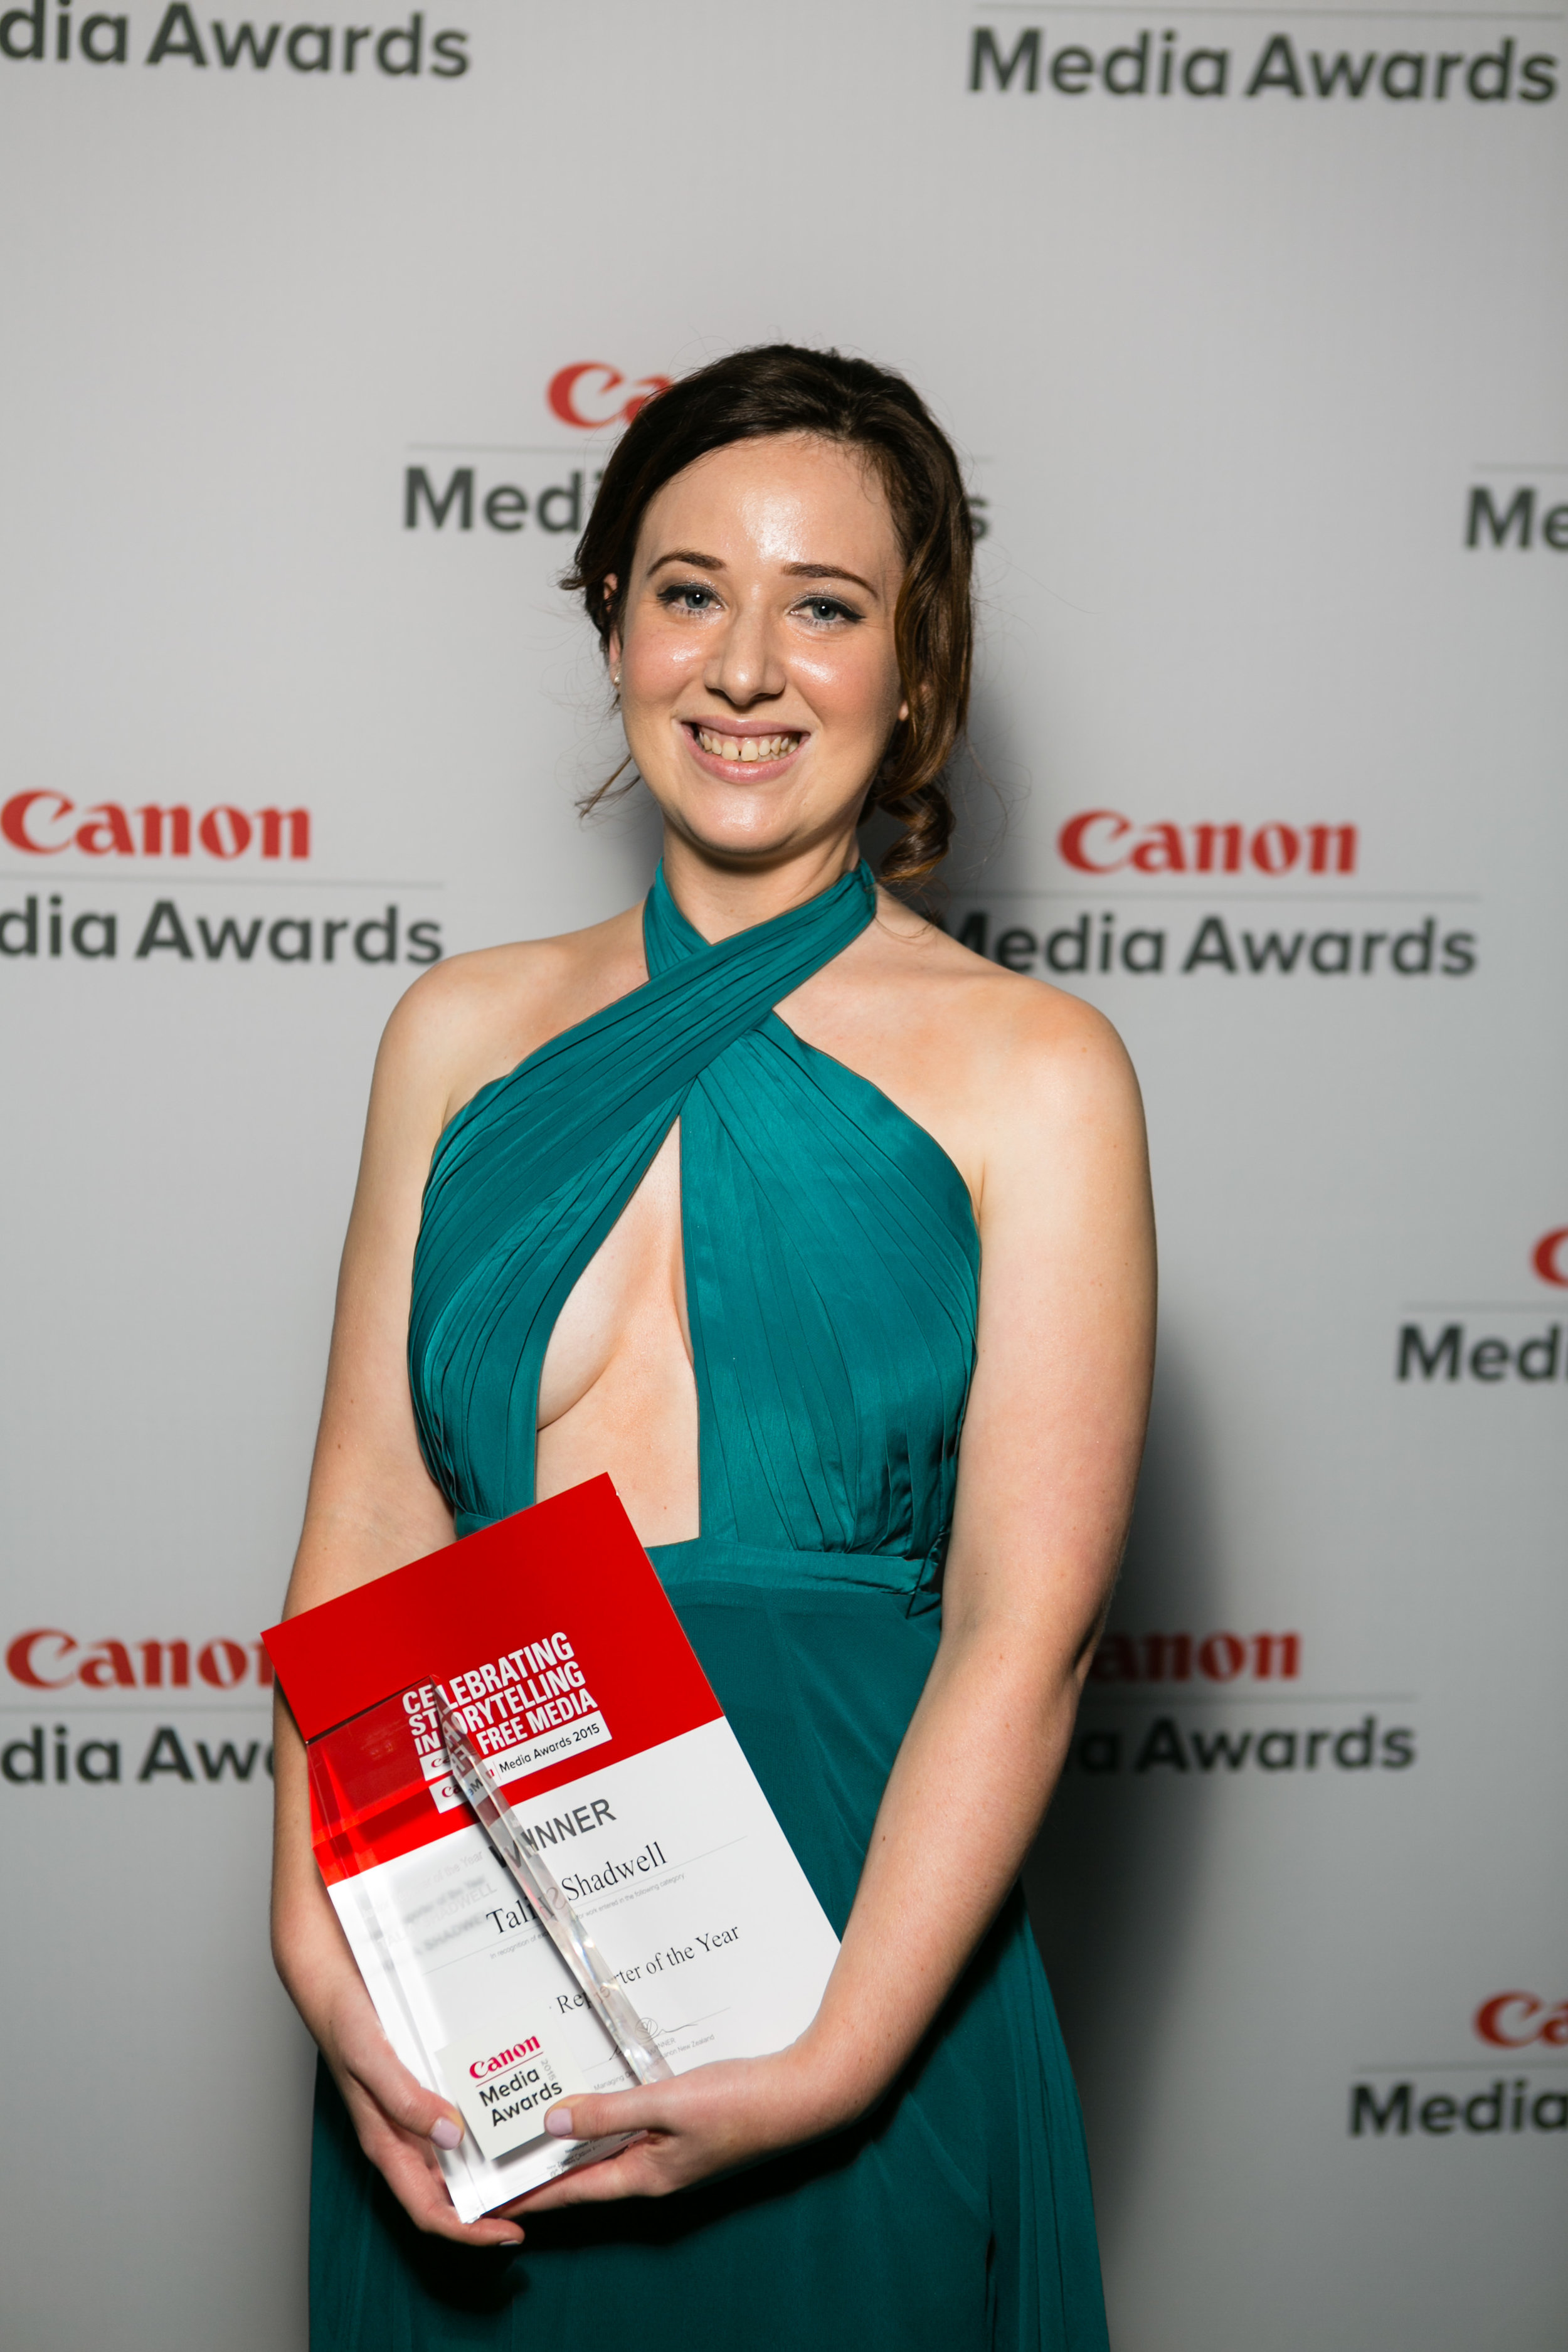 canon_media_awards_2015_interlike_nz_clinton_tudor-5941-194.jpg